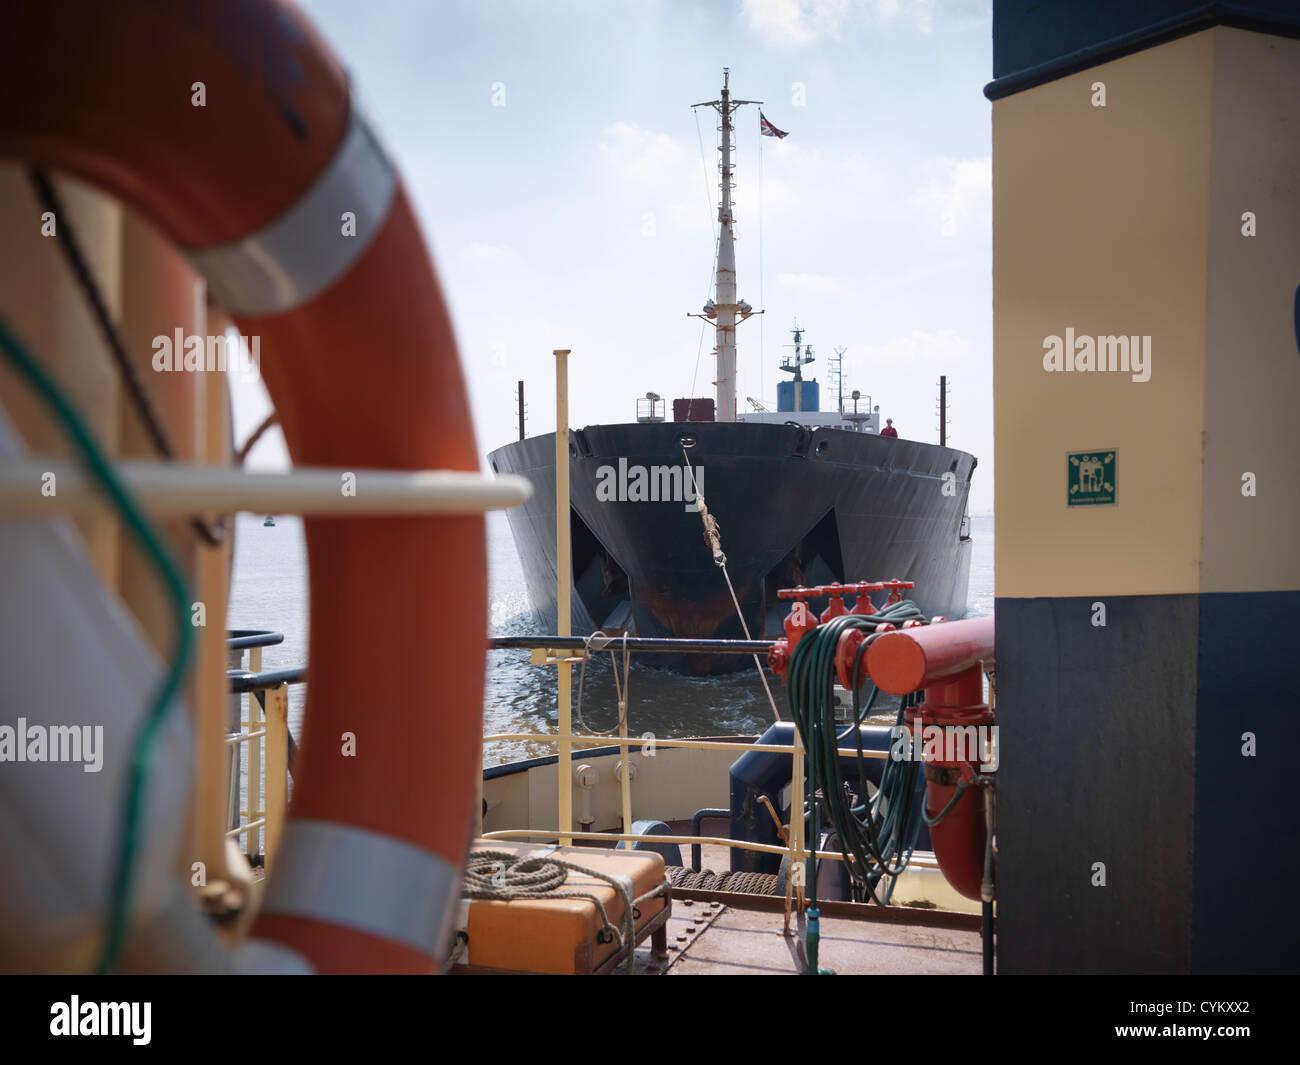 Tugboat pulling ship in ocean - Stock Image